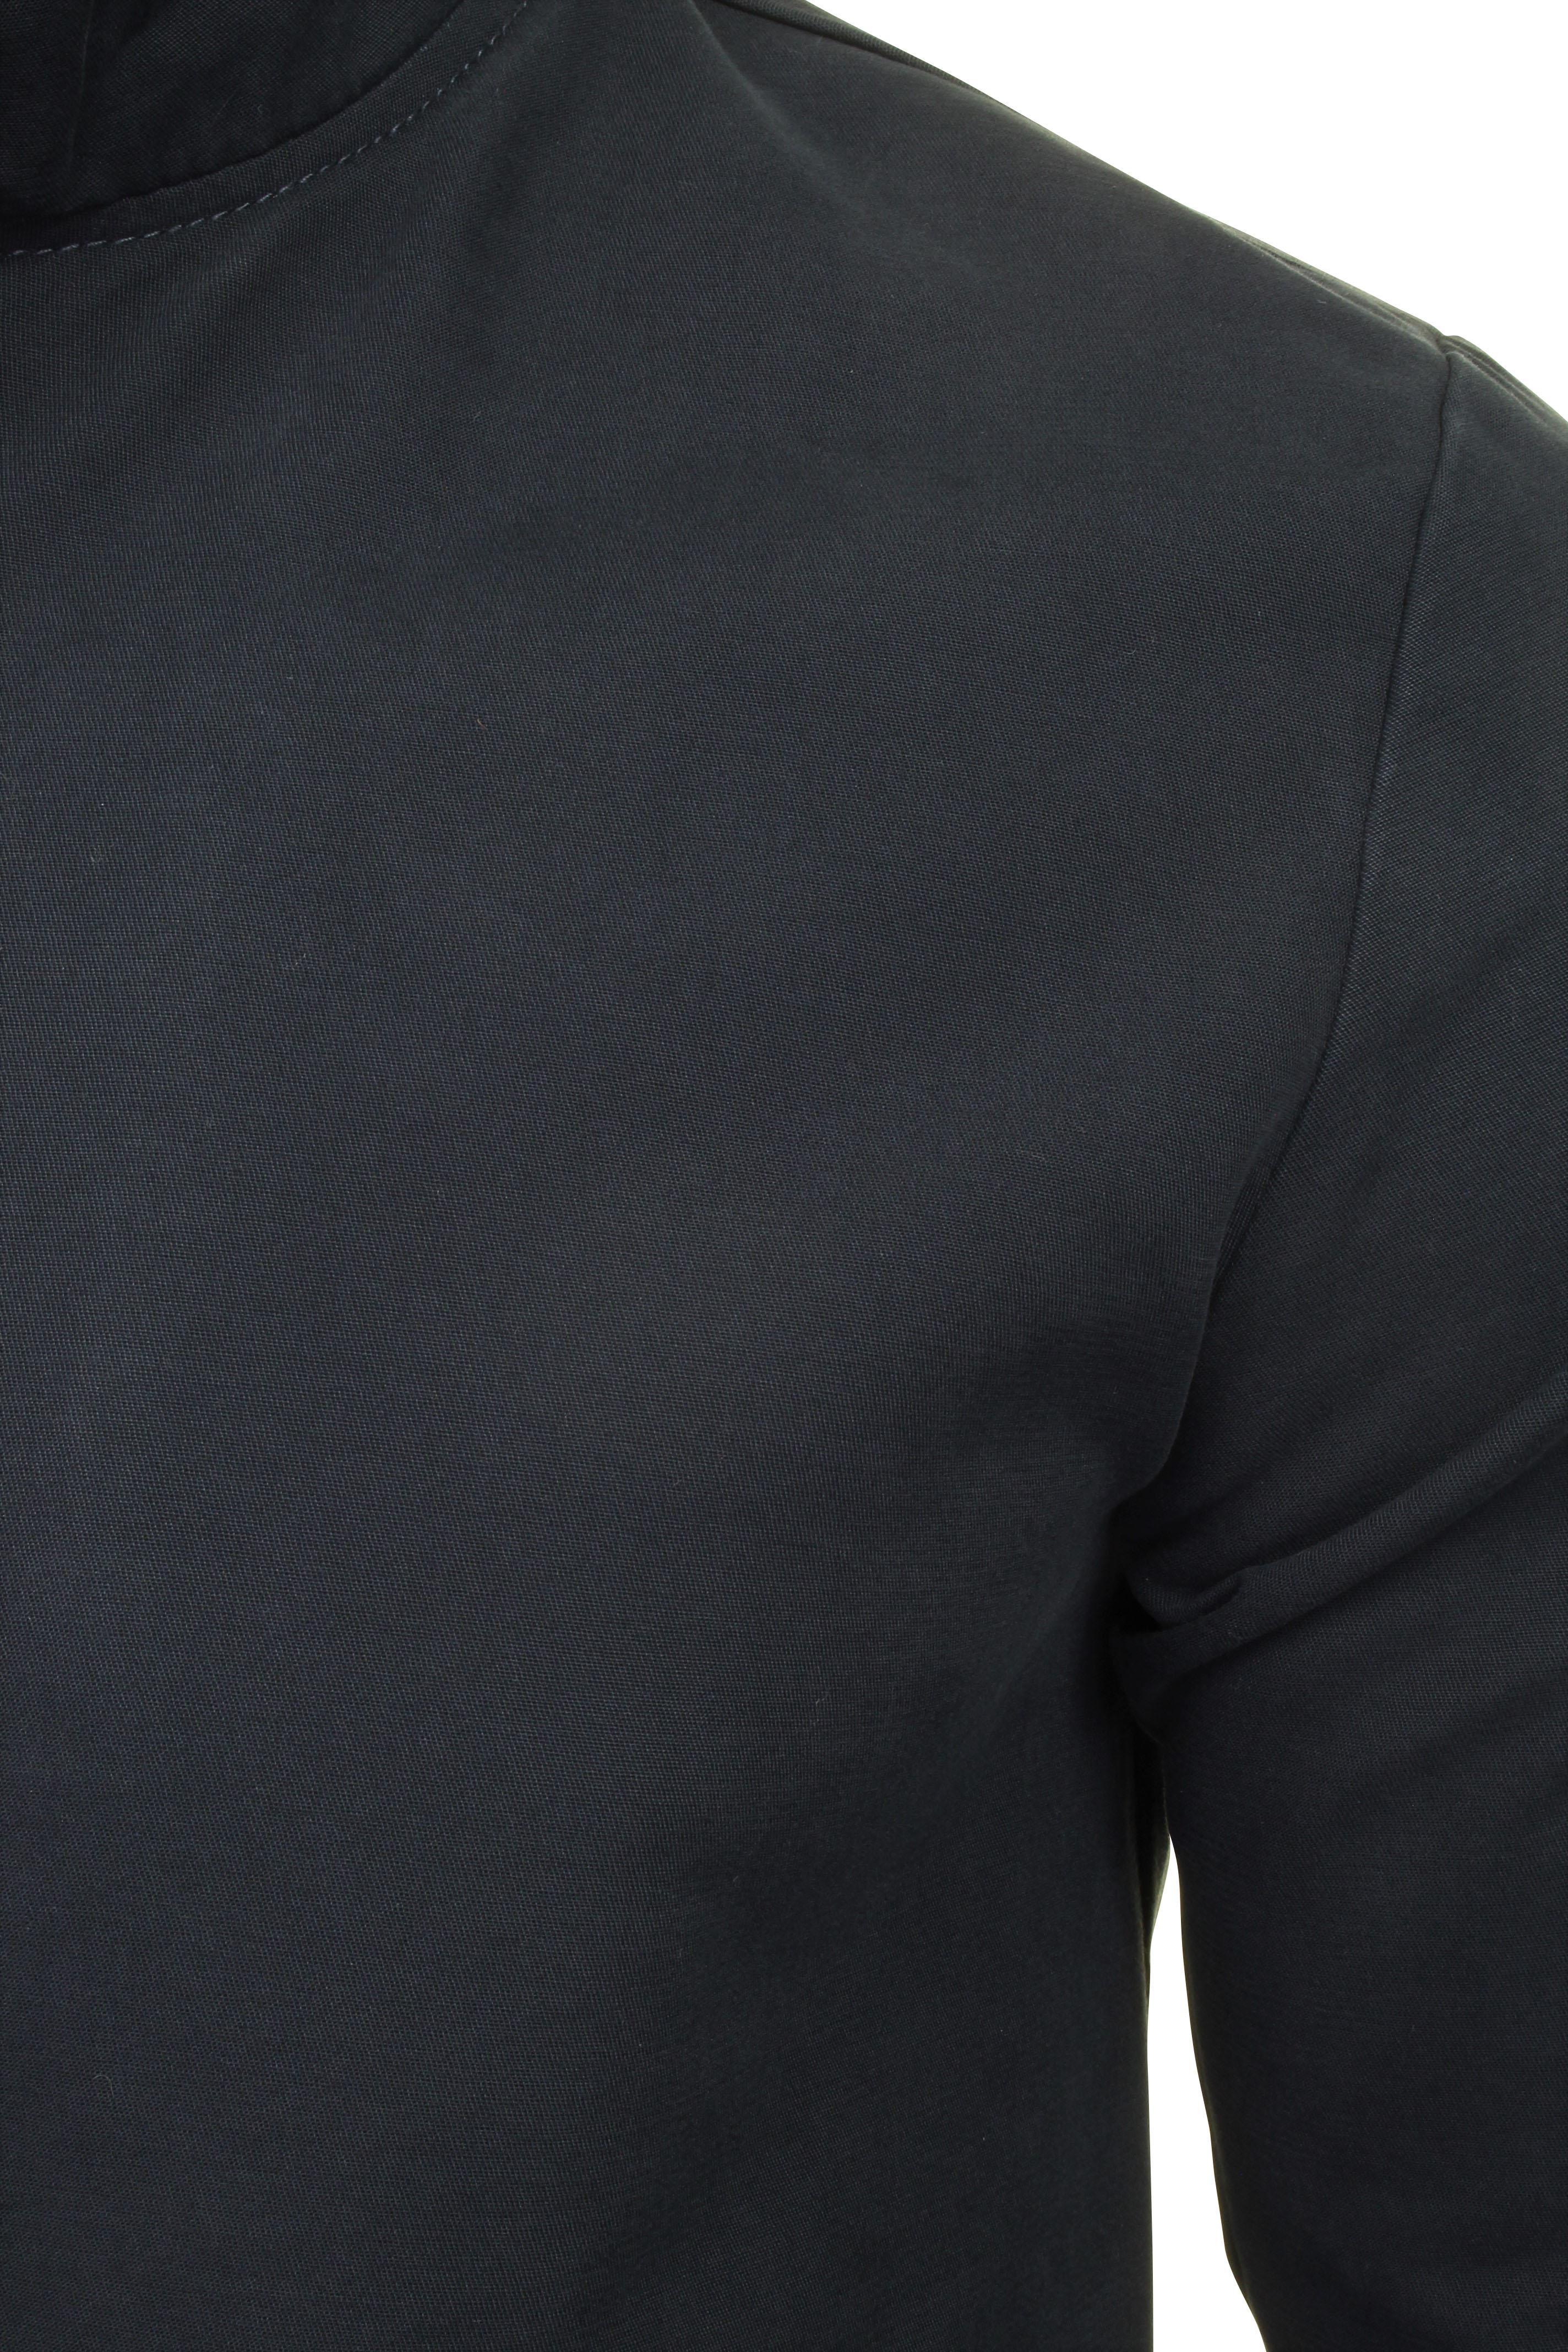 Jack-amp-Jones-Premium-039-jprsteve-039-para-hombre-Harrington-Jacket miniatura 3